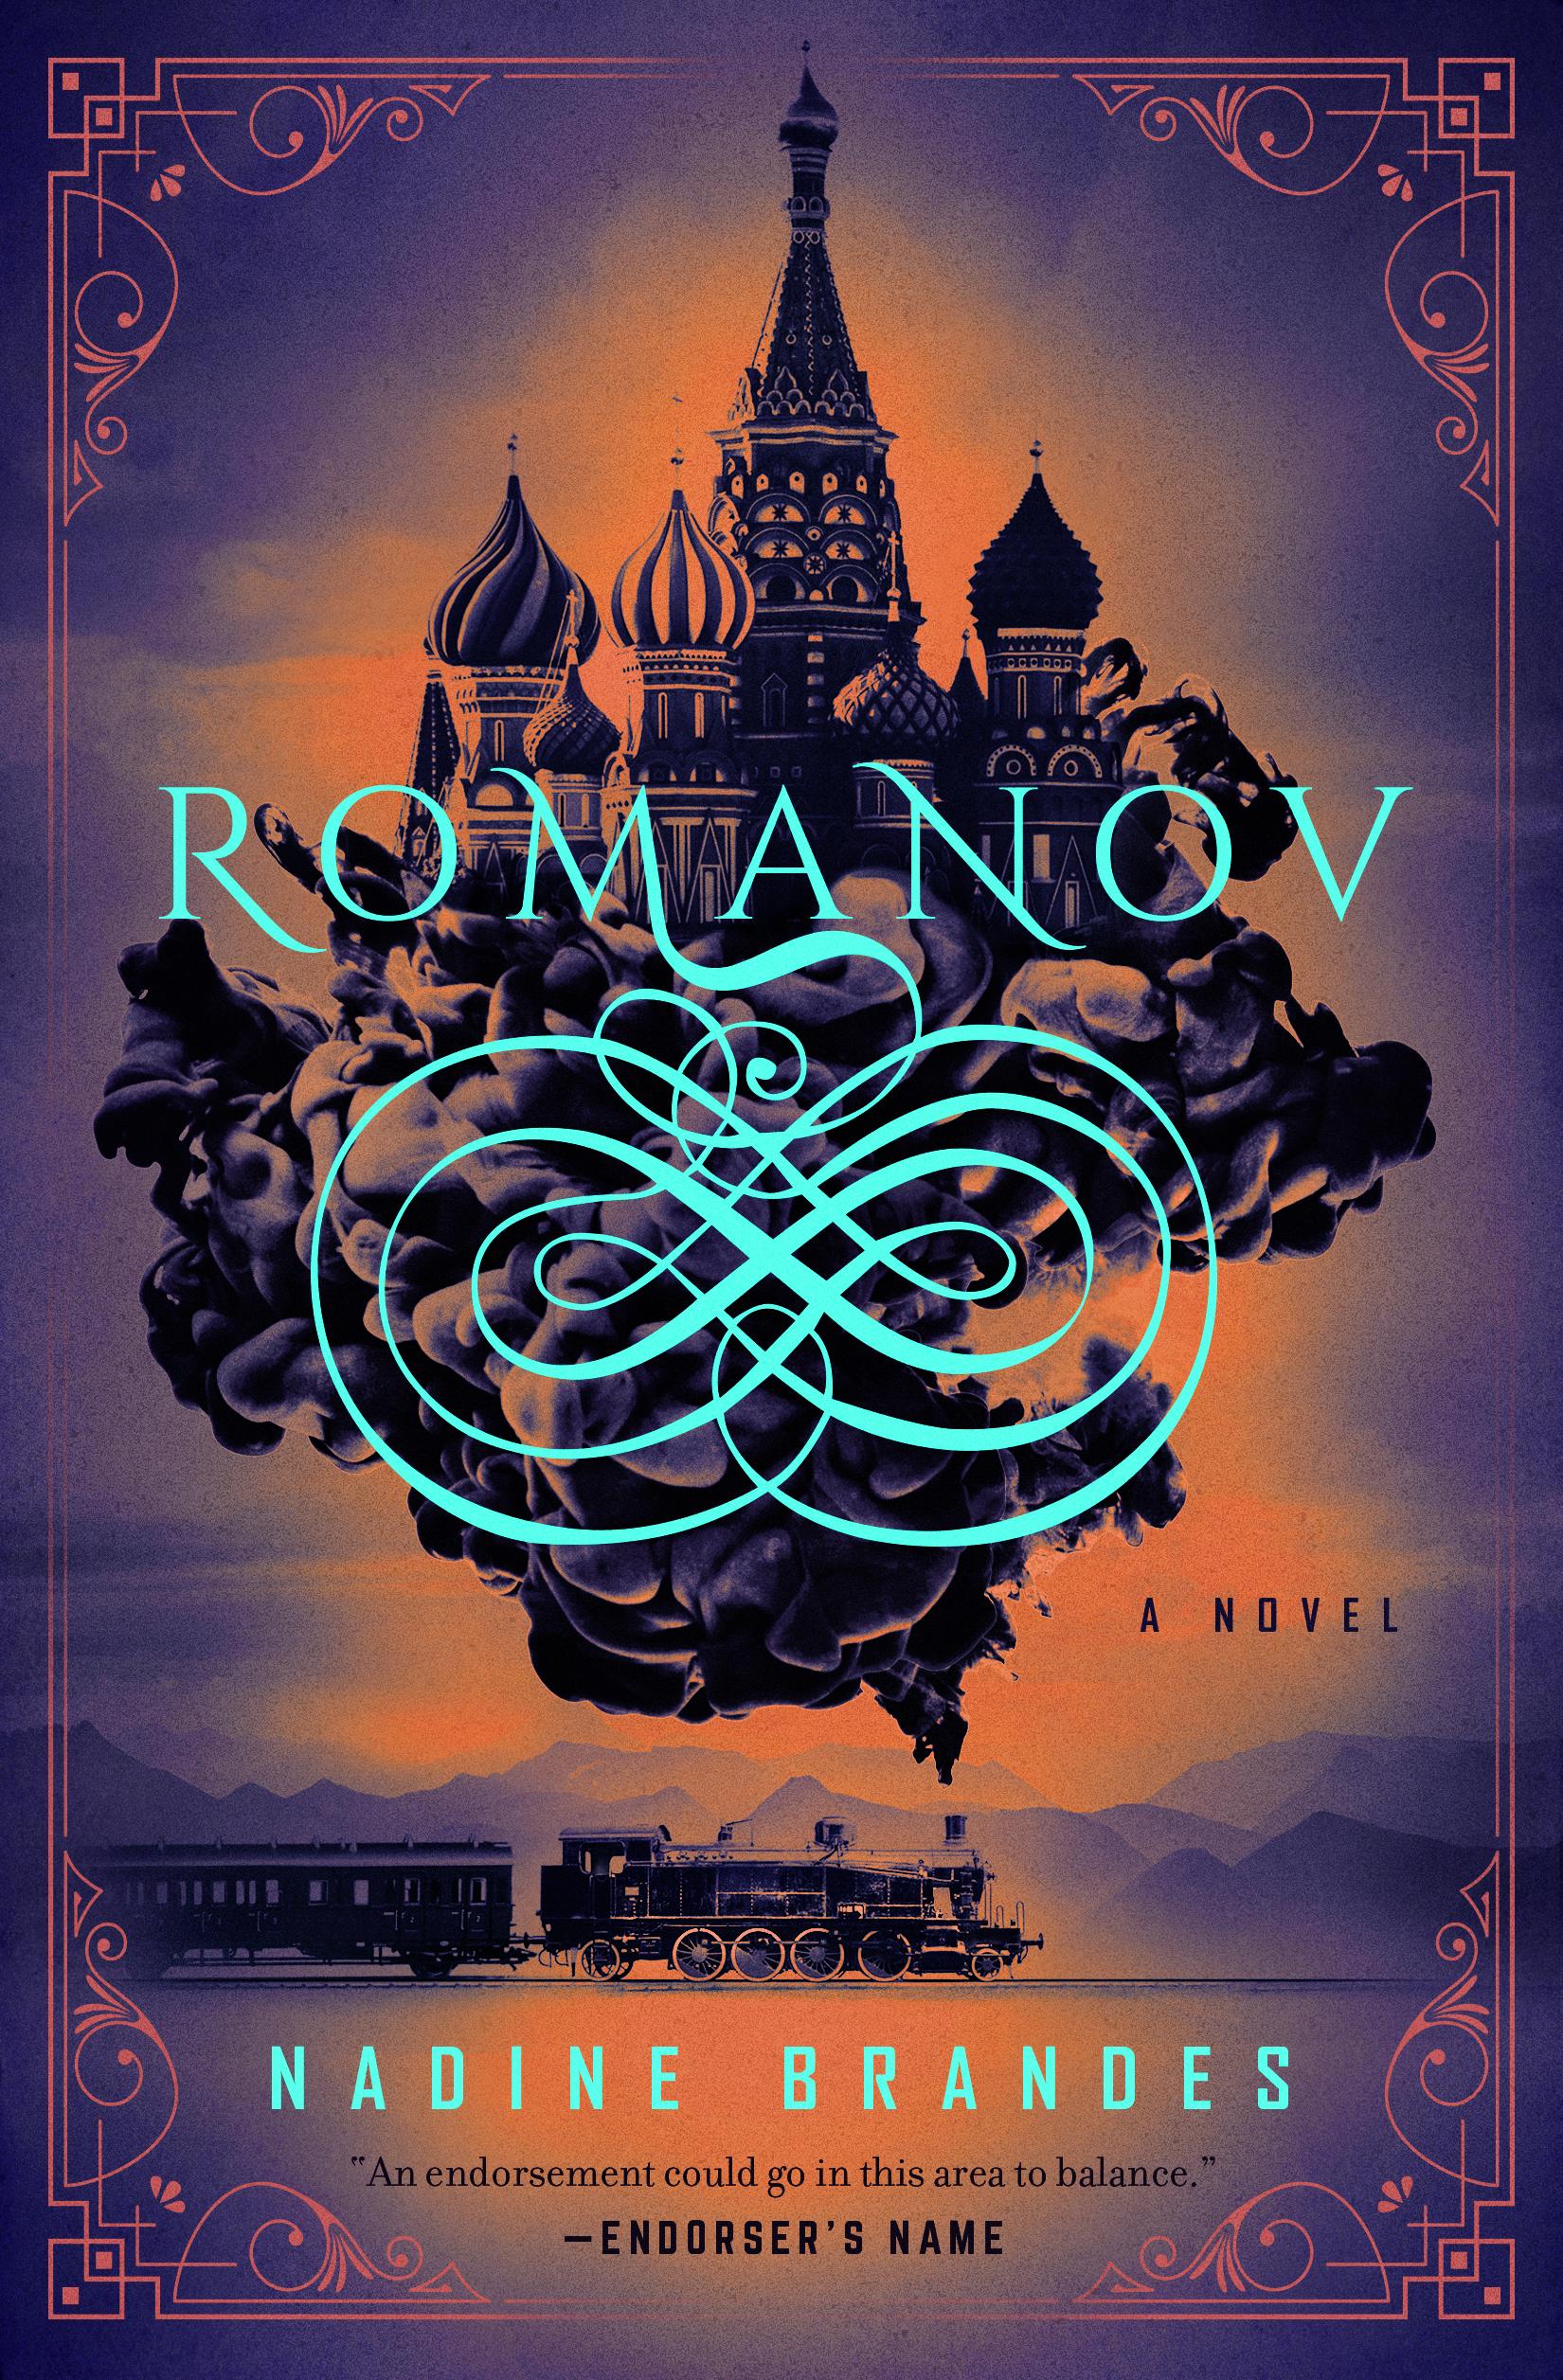 Romanov-1b.jpg